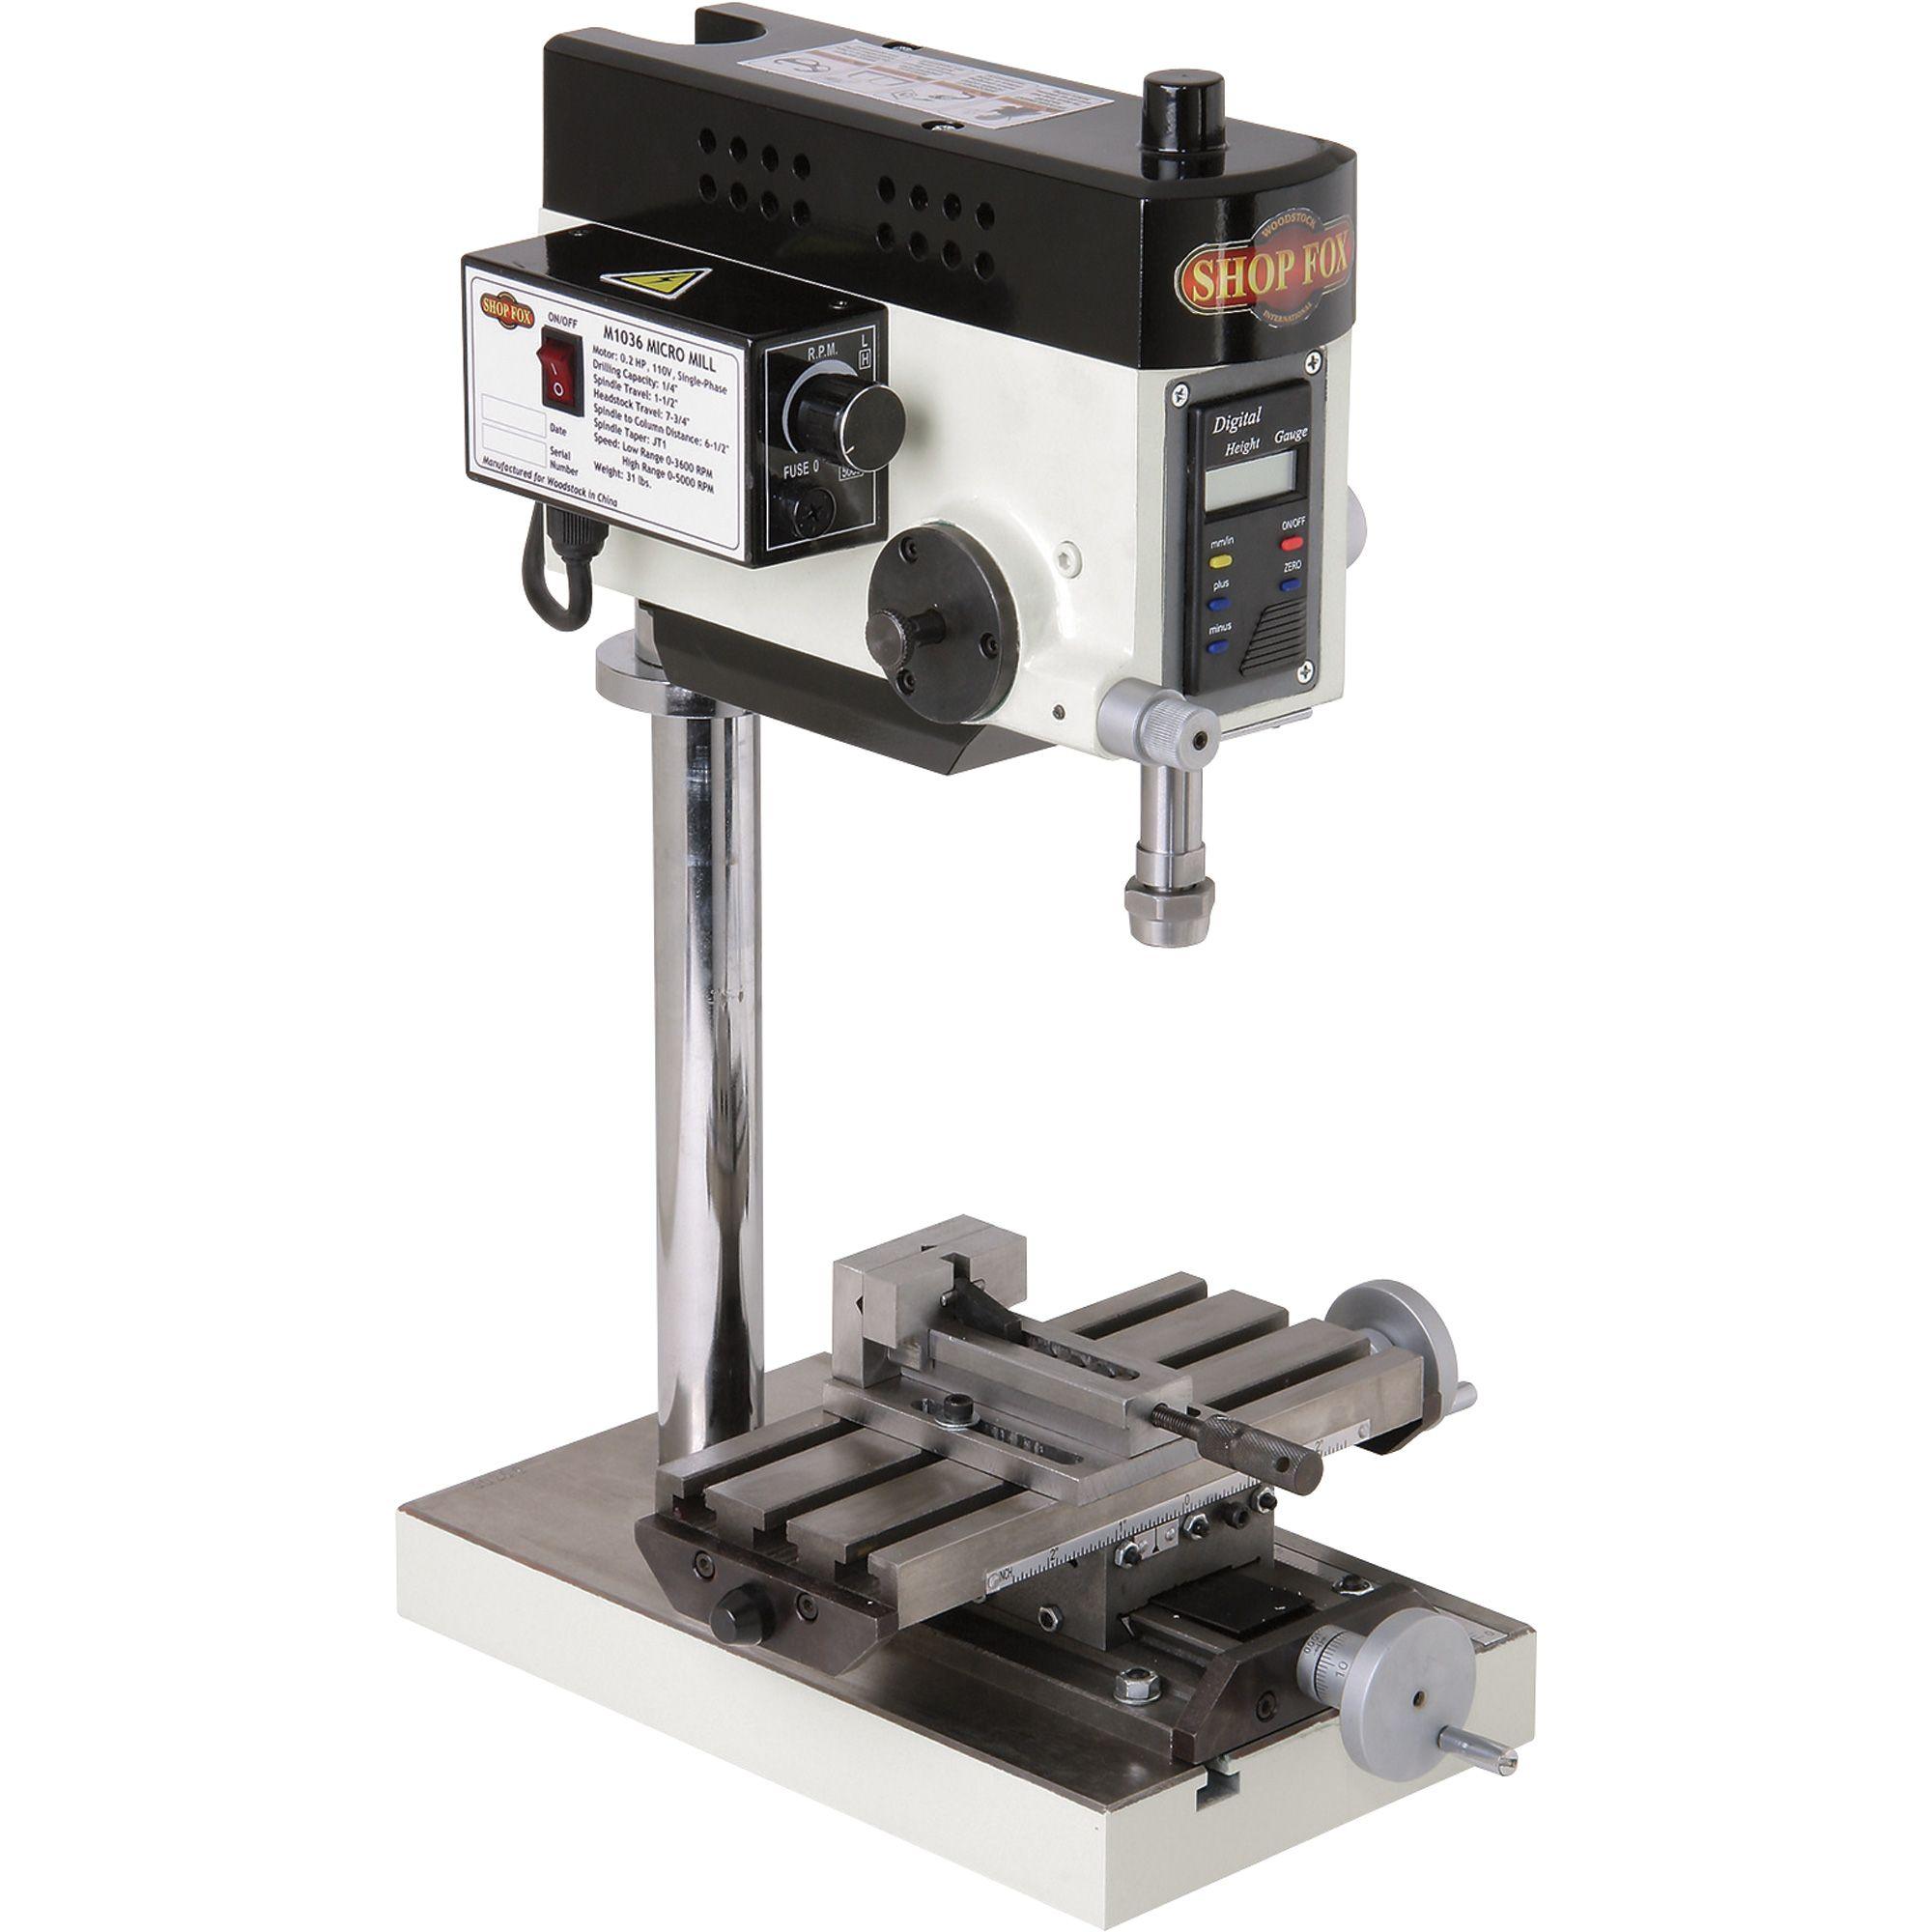 Shop Fox Micro Milling Machine Variable Speed 110v